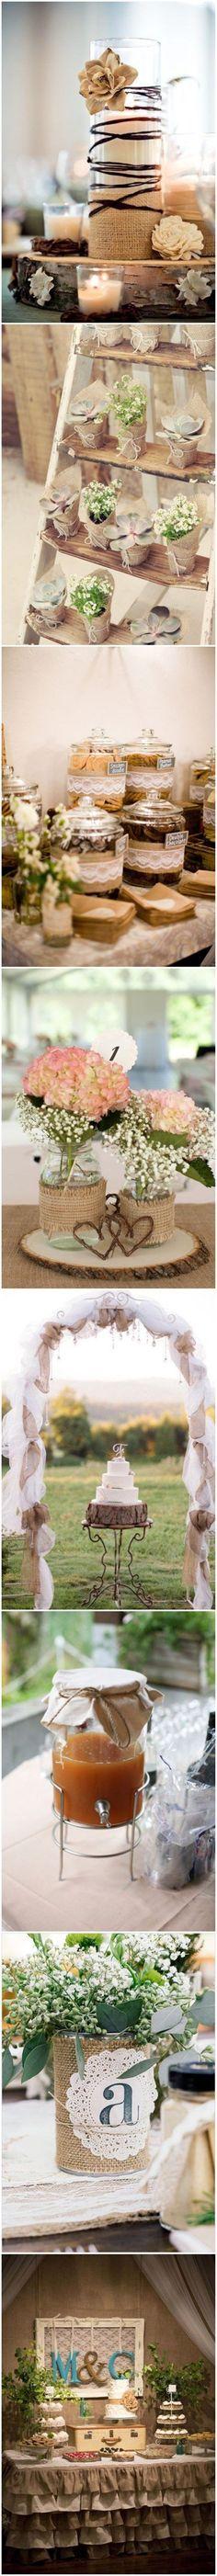 50+ Chic-Rustic Burlap and Lace Wedding Ideas #CamoWeddingIdeas